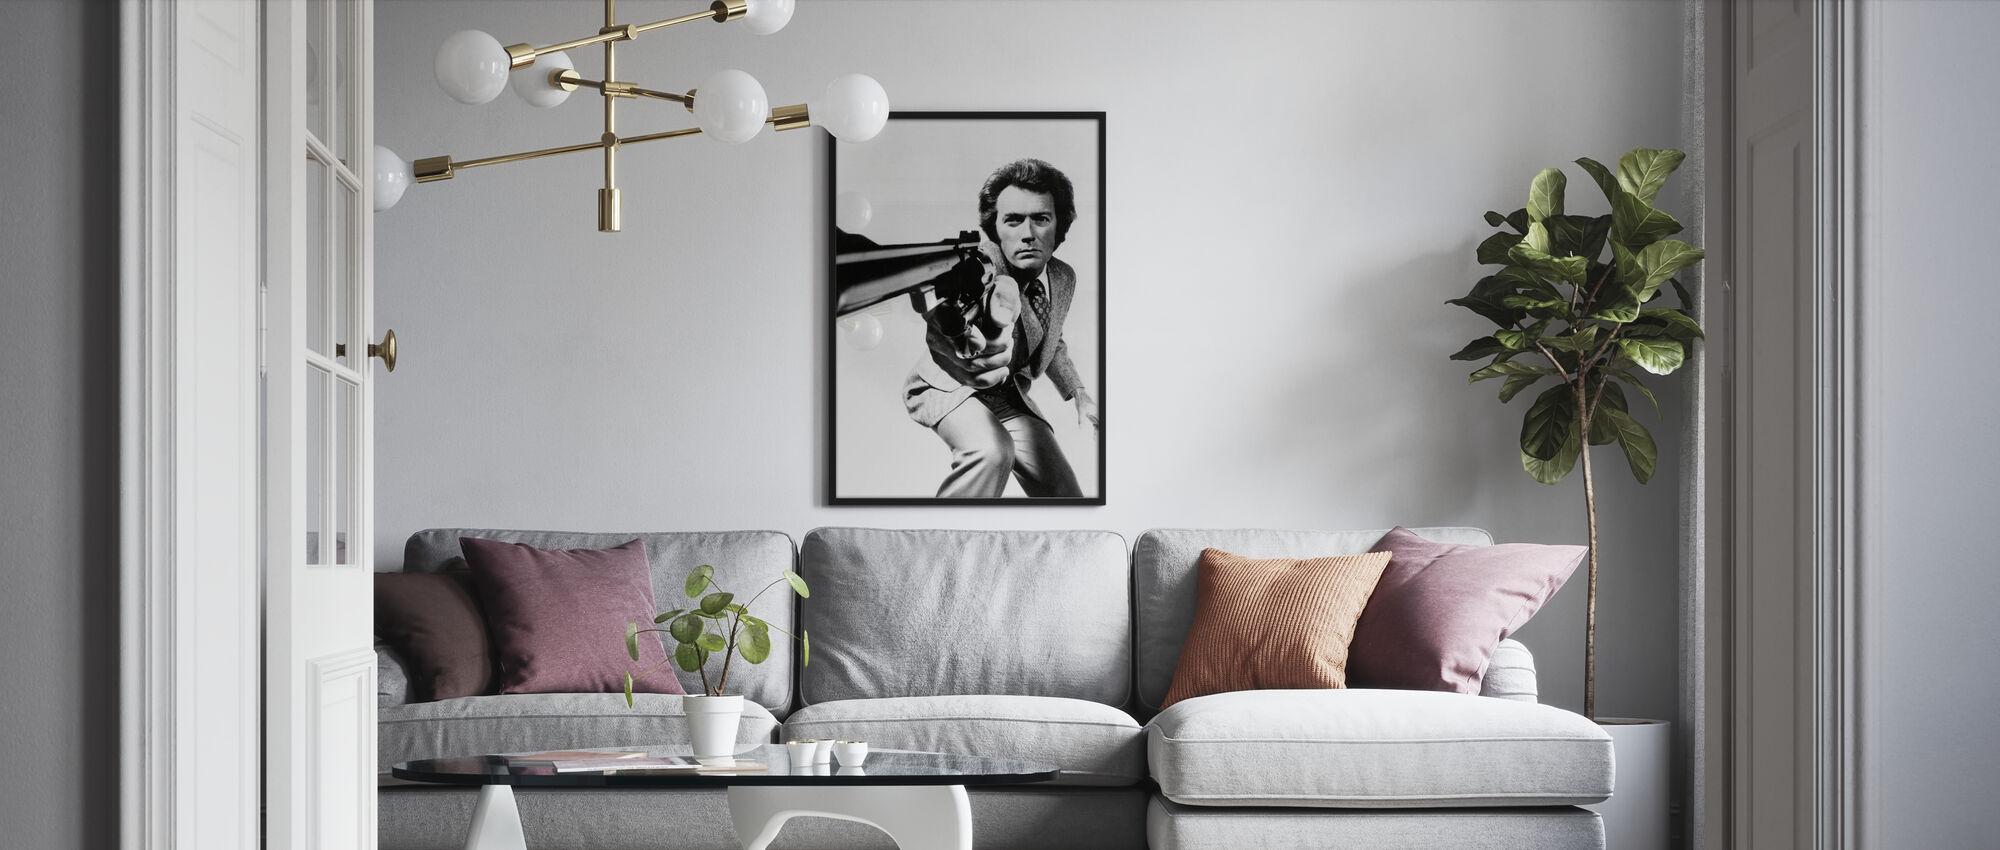 Clint Eastwood i Magnum Force - Plakat - Stue